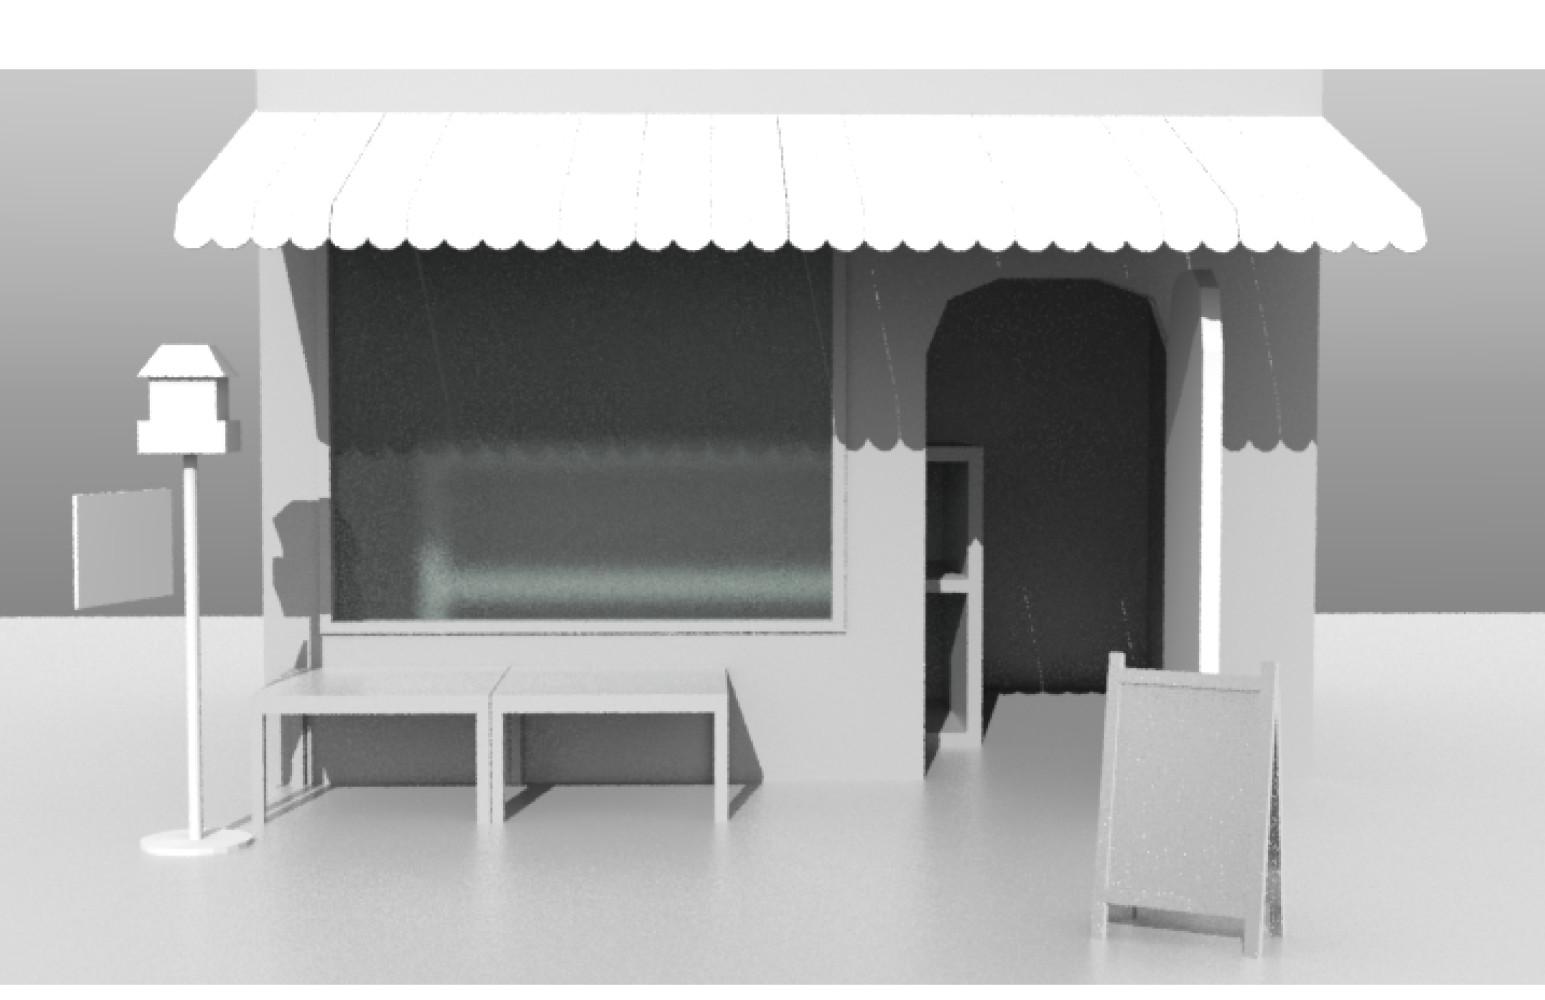 Basic 3D Model (done by MWTetsu)